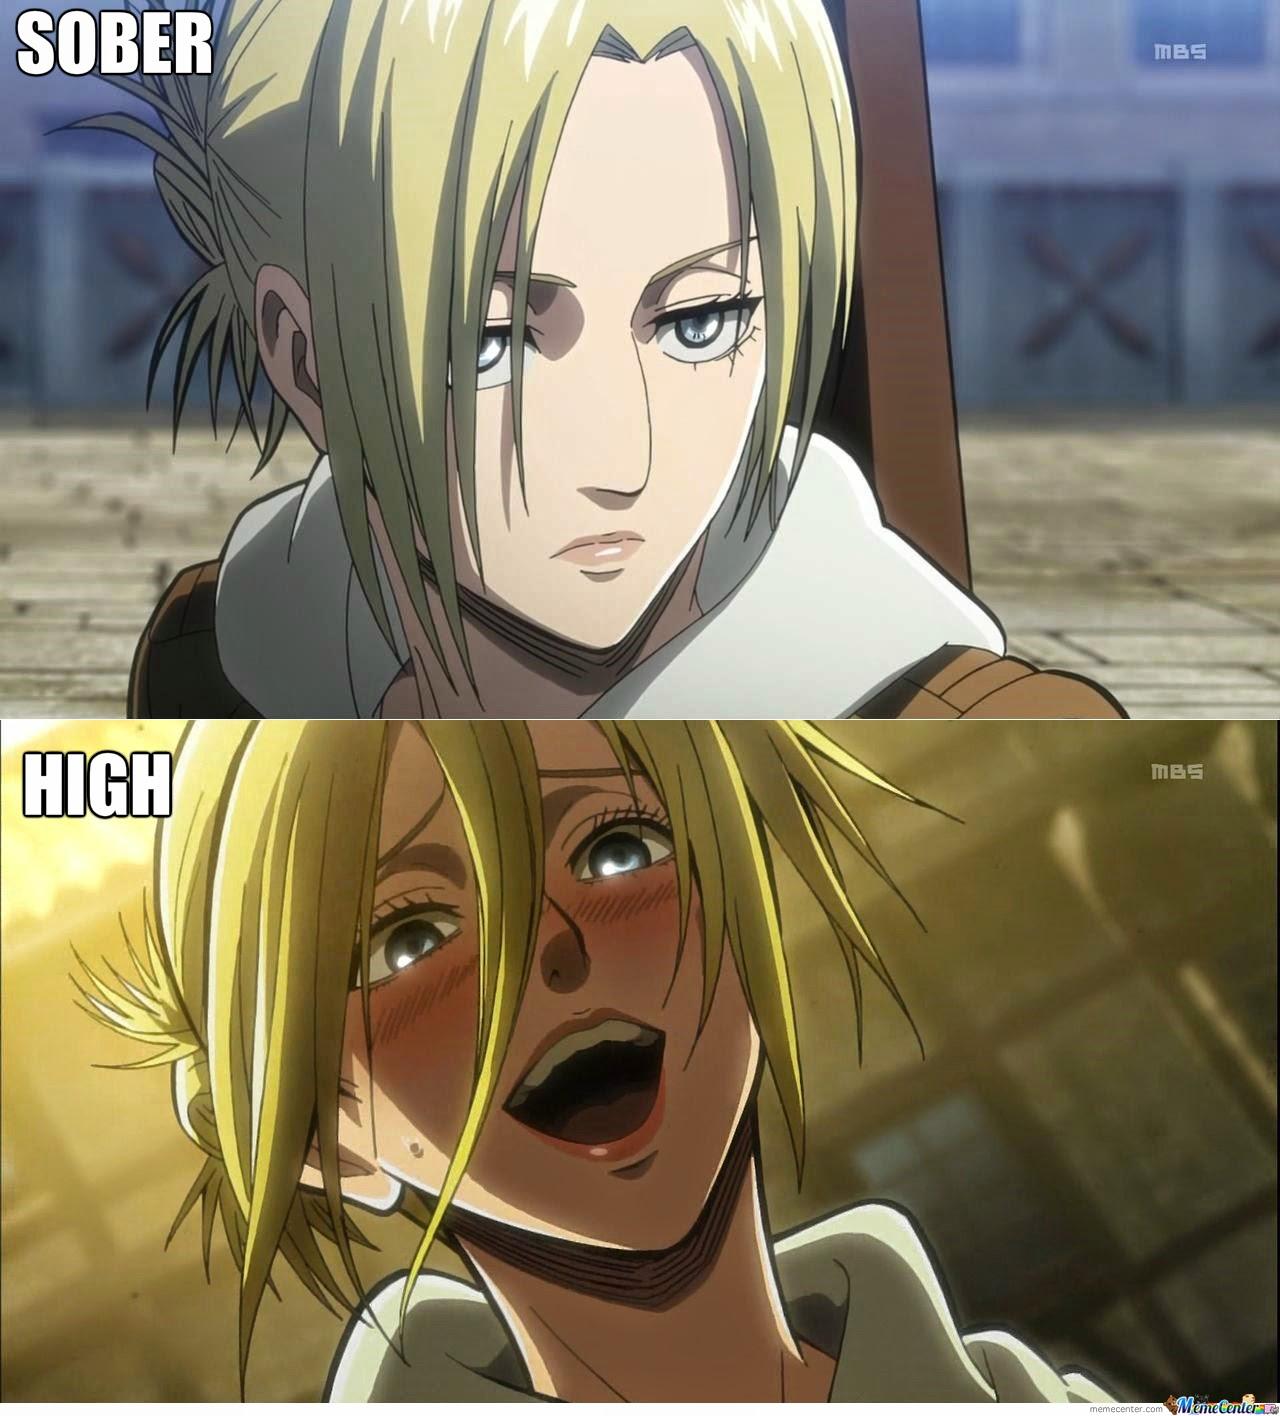 attack on titan Meme Collection 2014 | Anime Meme